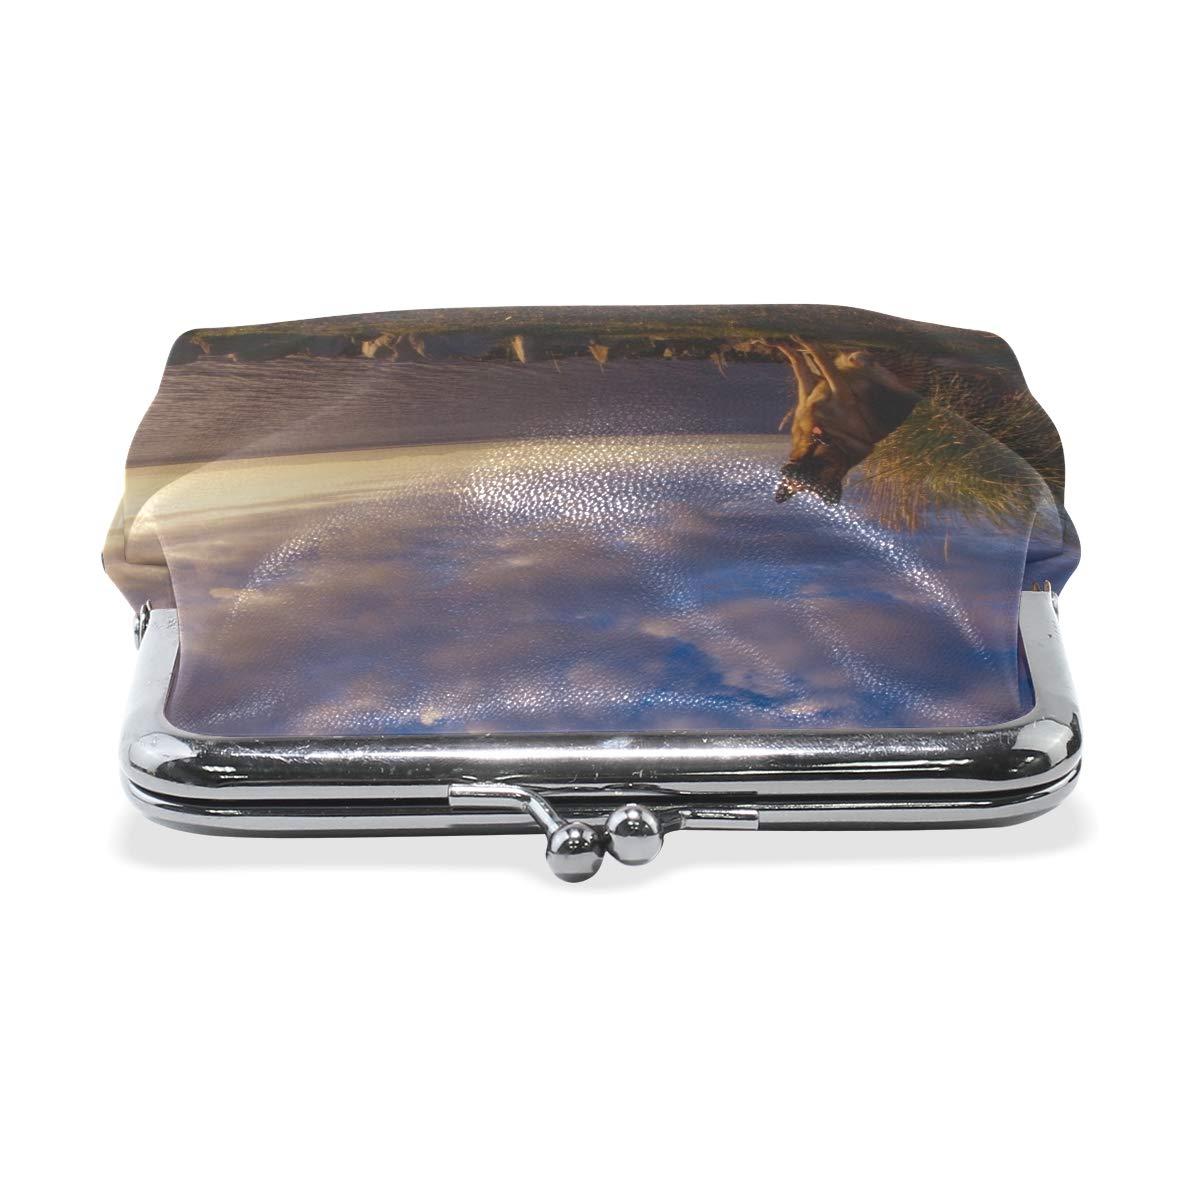 Rh Studio Coin Purse Clasp Closure Dog Sheep Sky Sea Waiting Print Wallet Exquisite Coin Pouch Girls Women Clutch Handbag Exquisite Gift